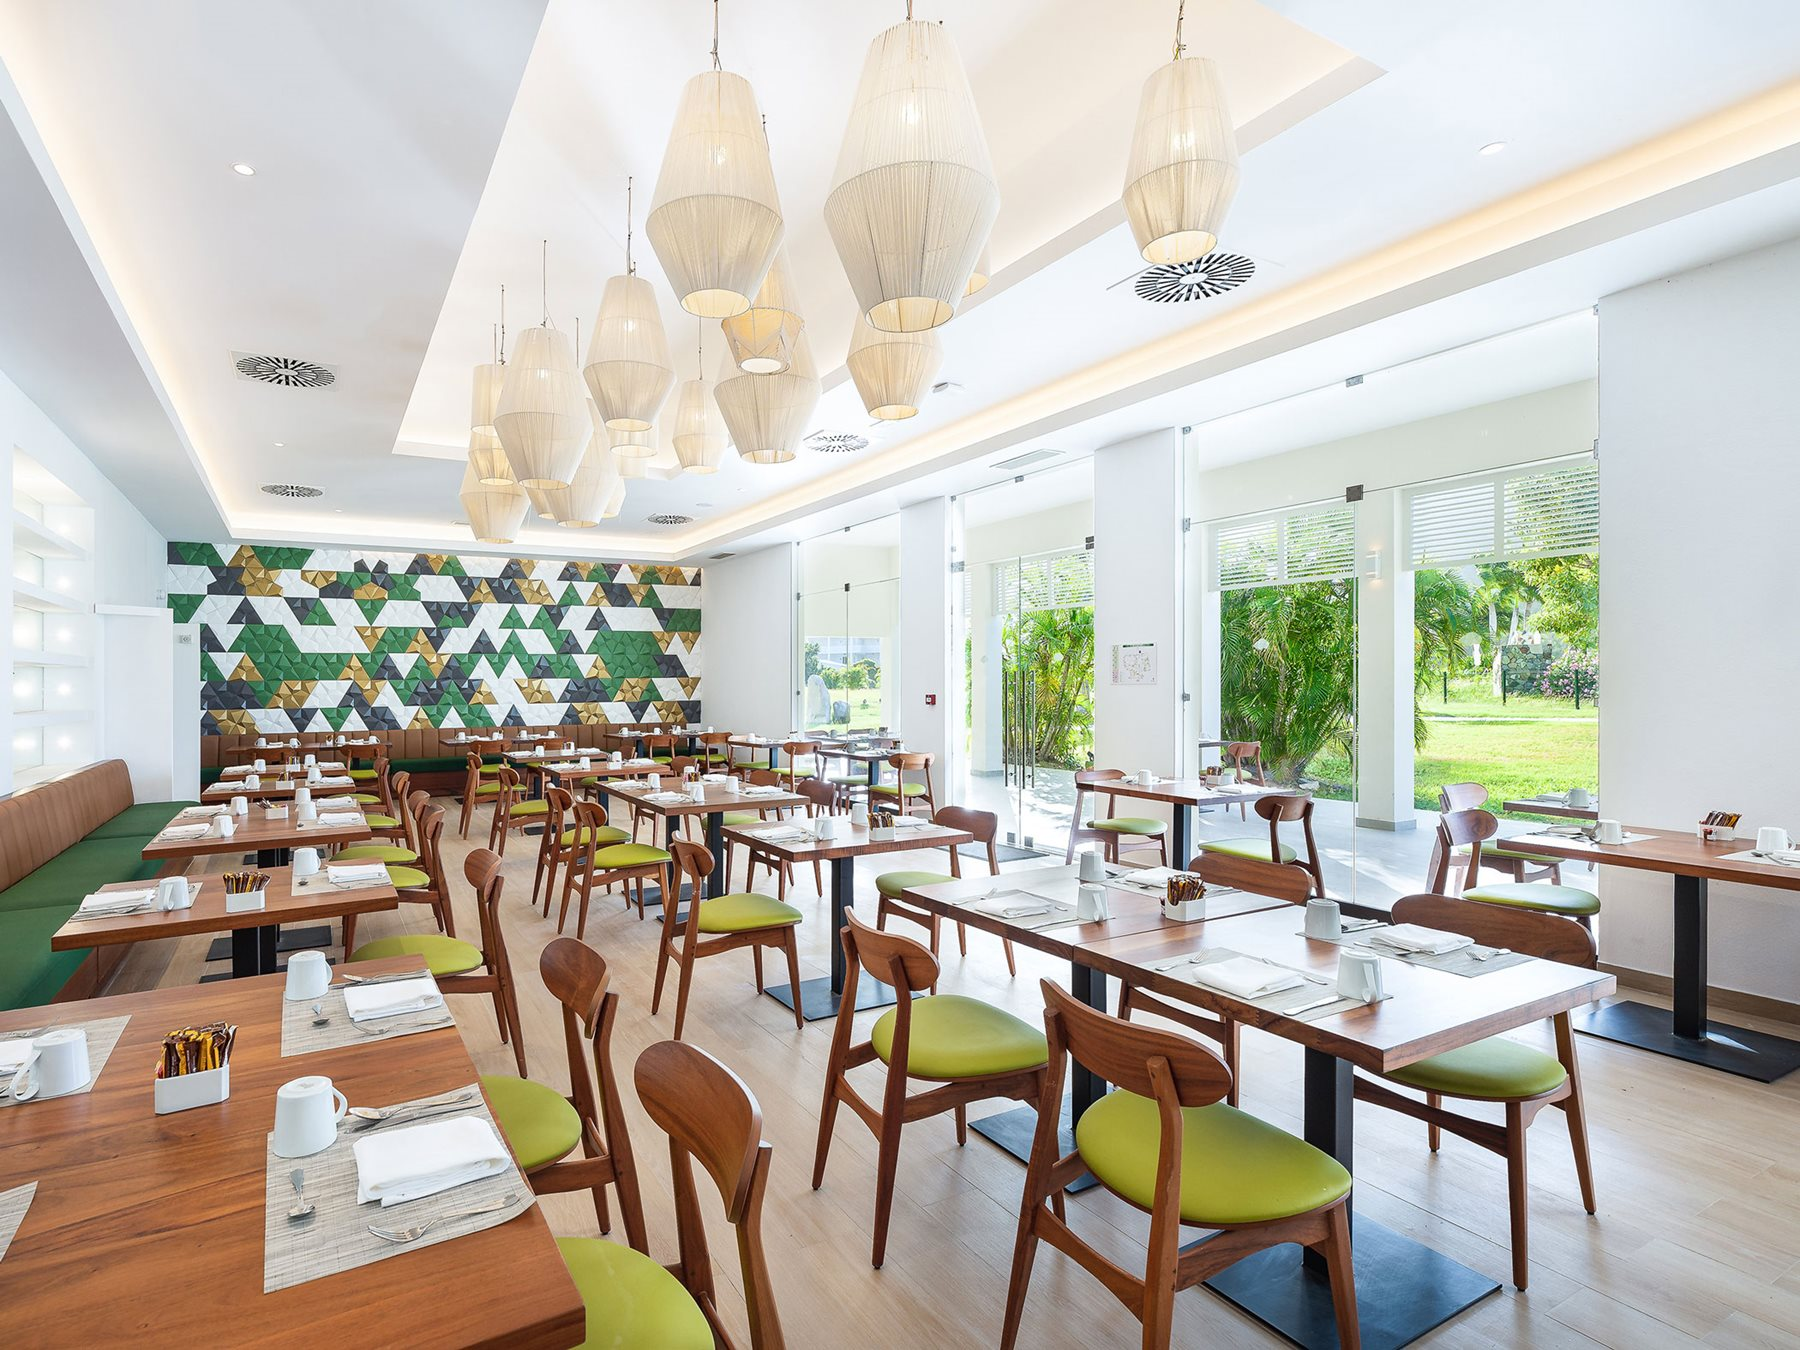 SXM-Secrets-St-Martin-Resort-Spa-Restaurant-Market-Cafe-001